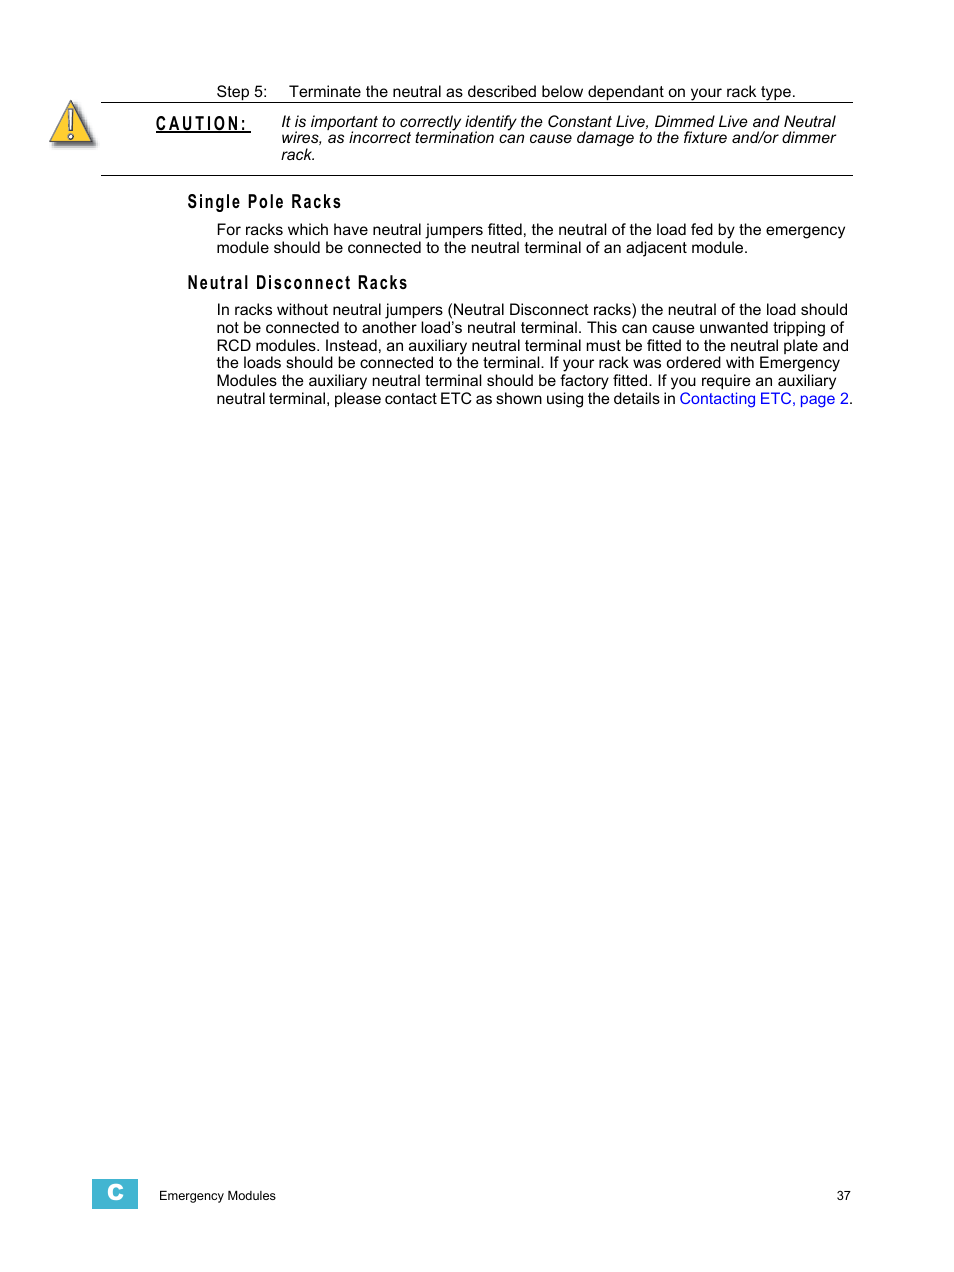 Single pole racks, Neutral disconnect racks | ETC Sensor3 CE (ESR3